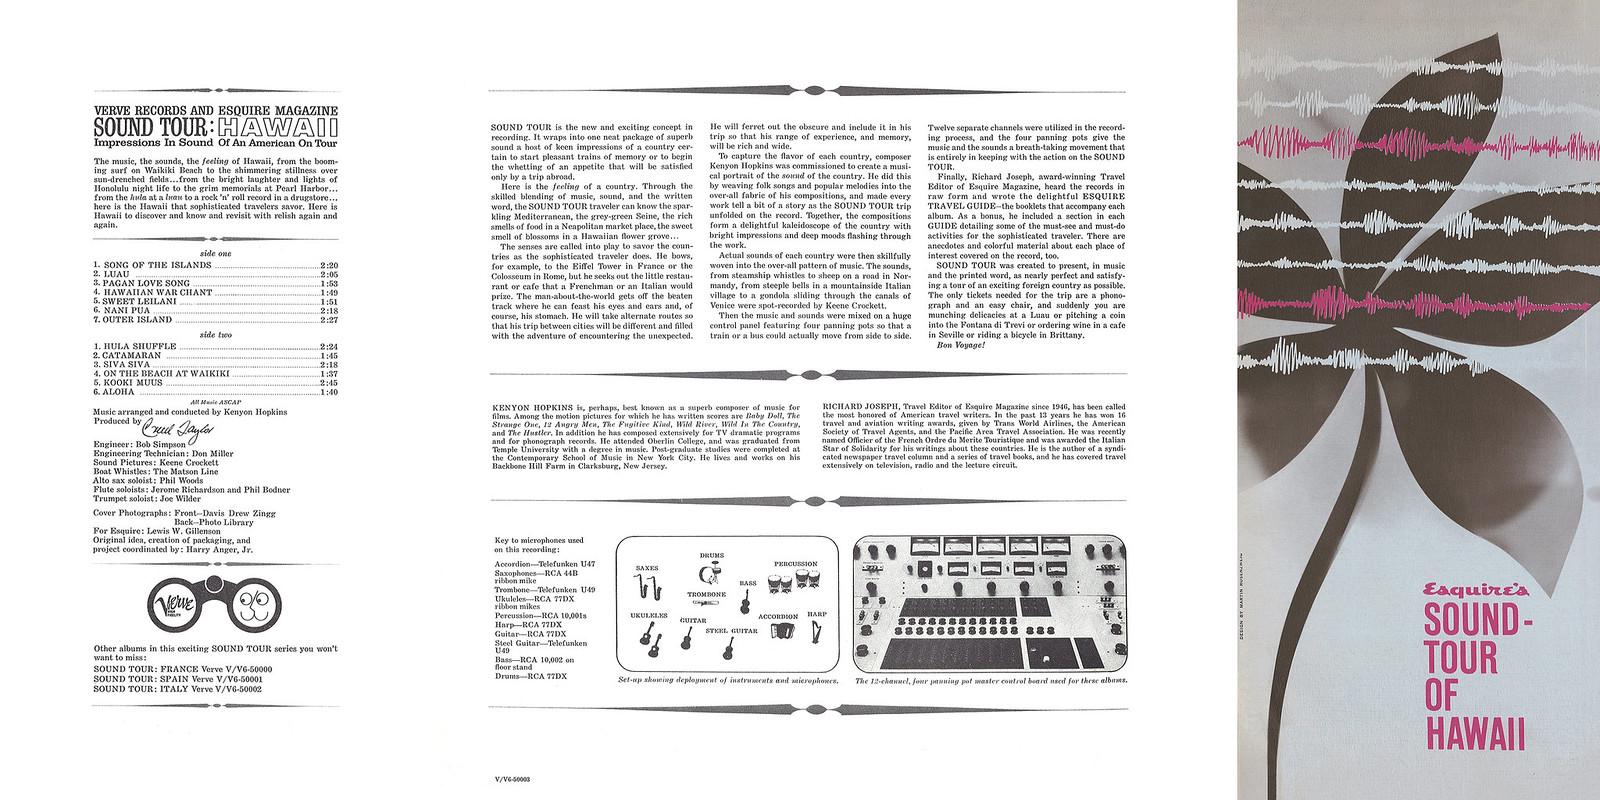 Kenyon Hopkins - Esquire Magazine Sound Tour Hawaii